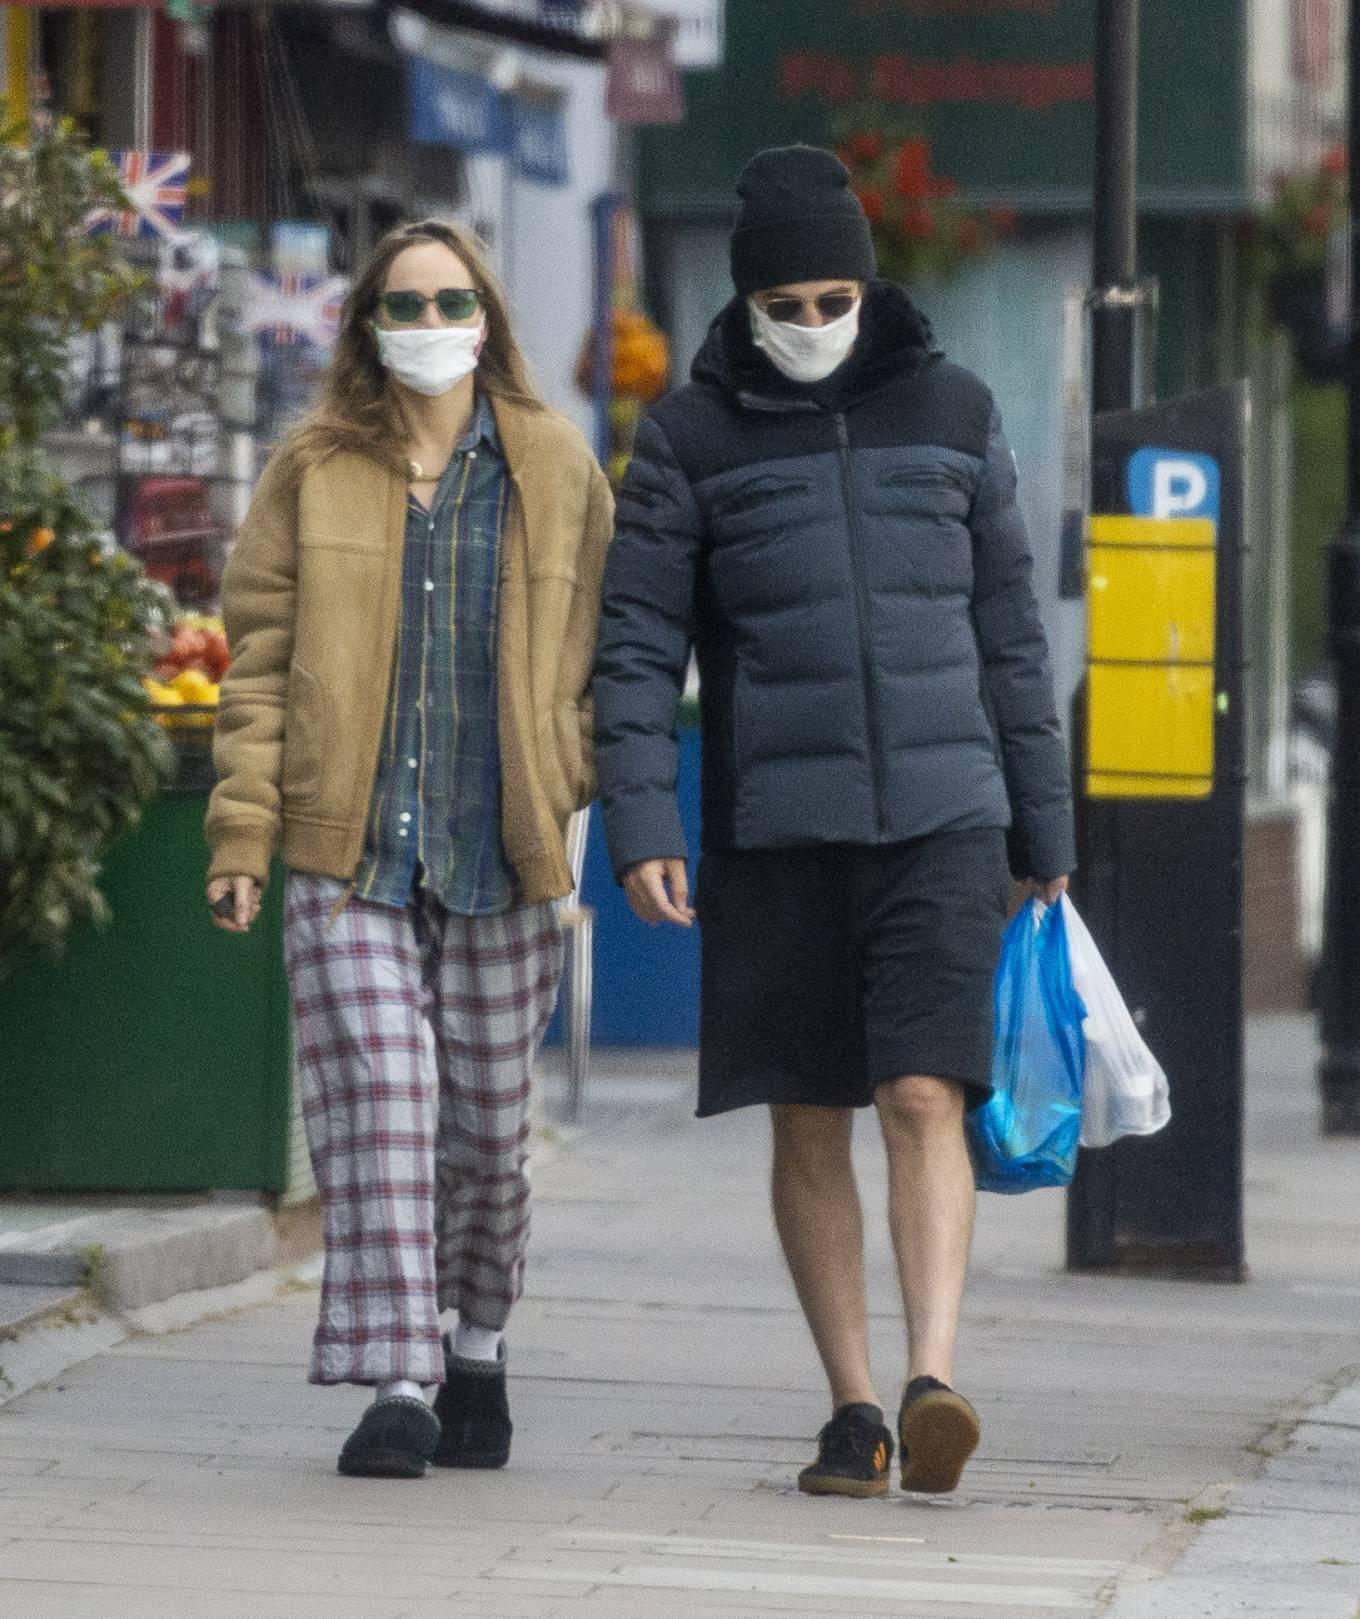 Suki Waterhouse 2020 : Suki Waterhouse and Robert Pattinson – Wearing matching face masks in London-07